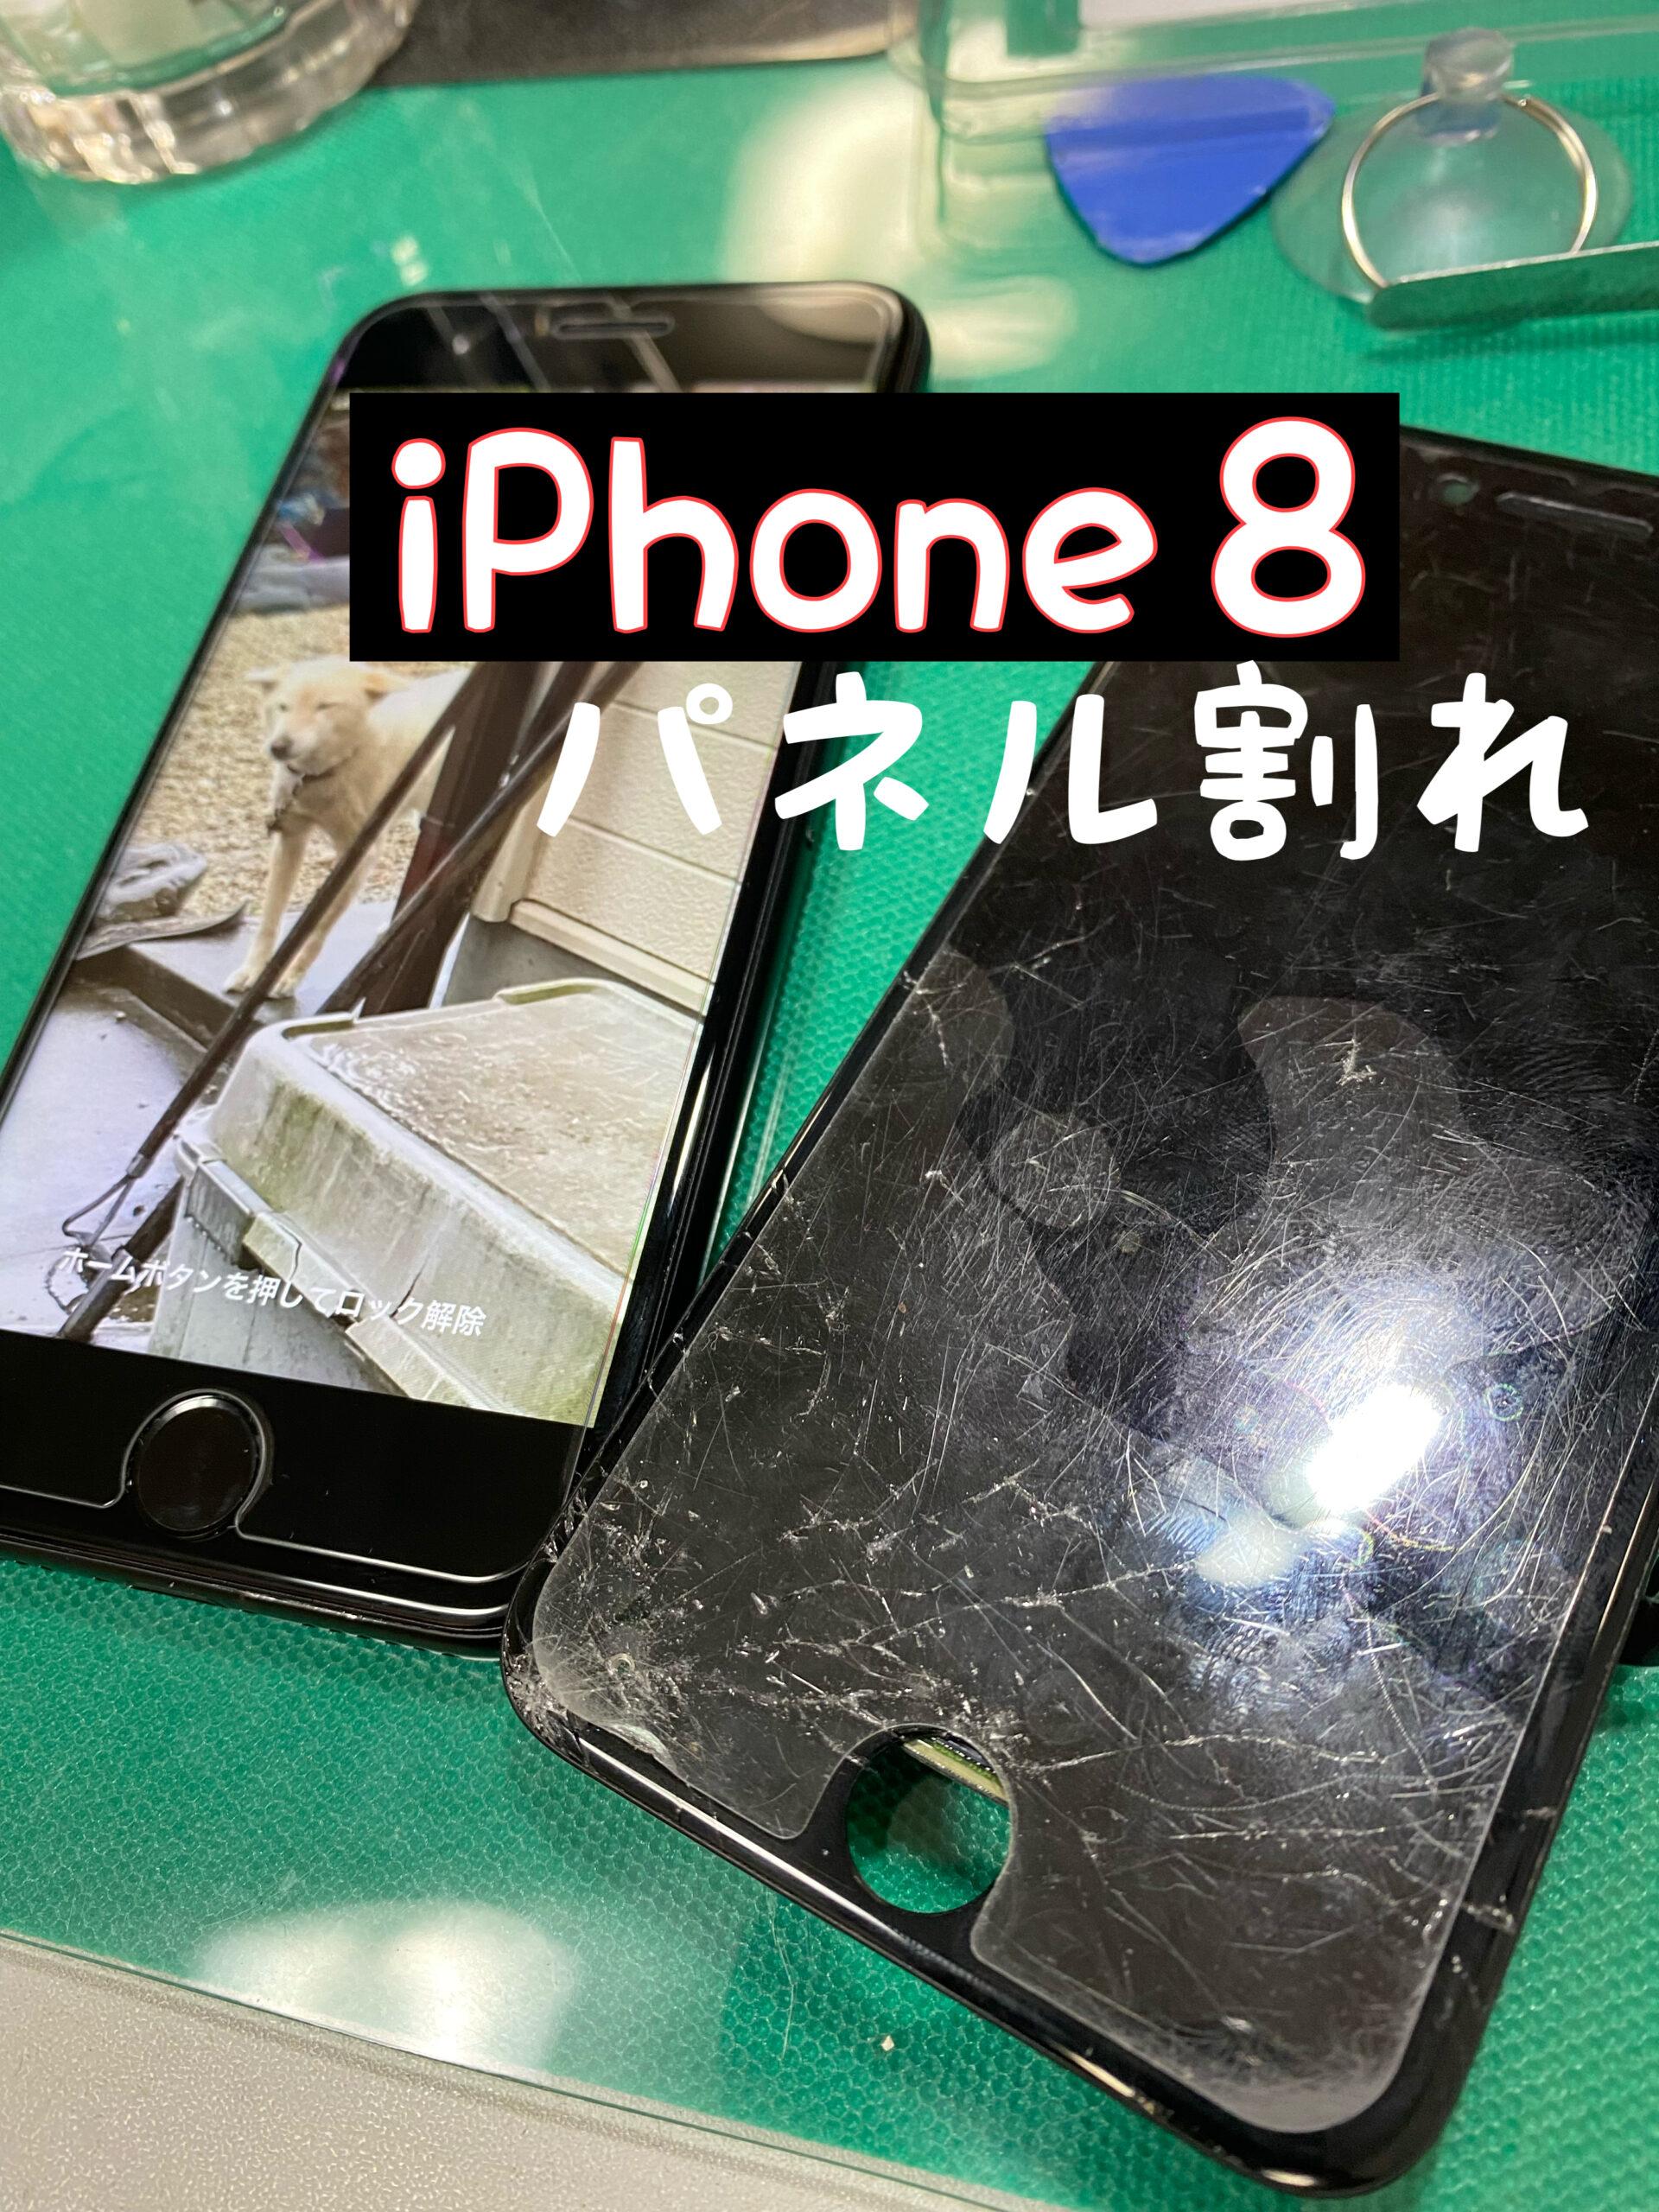 iPhone修理 江南市 犬山市 ドンキ 安い ドン・キホーテ 扶桑町 大口町 パネル割れ